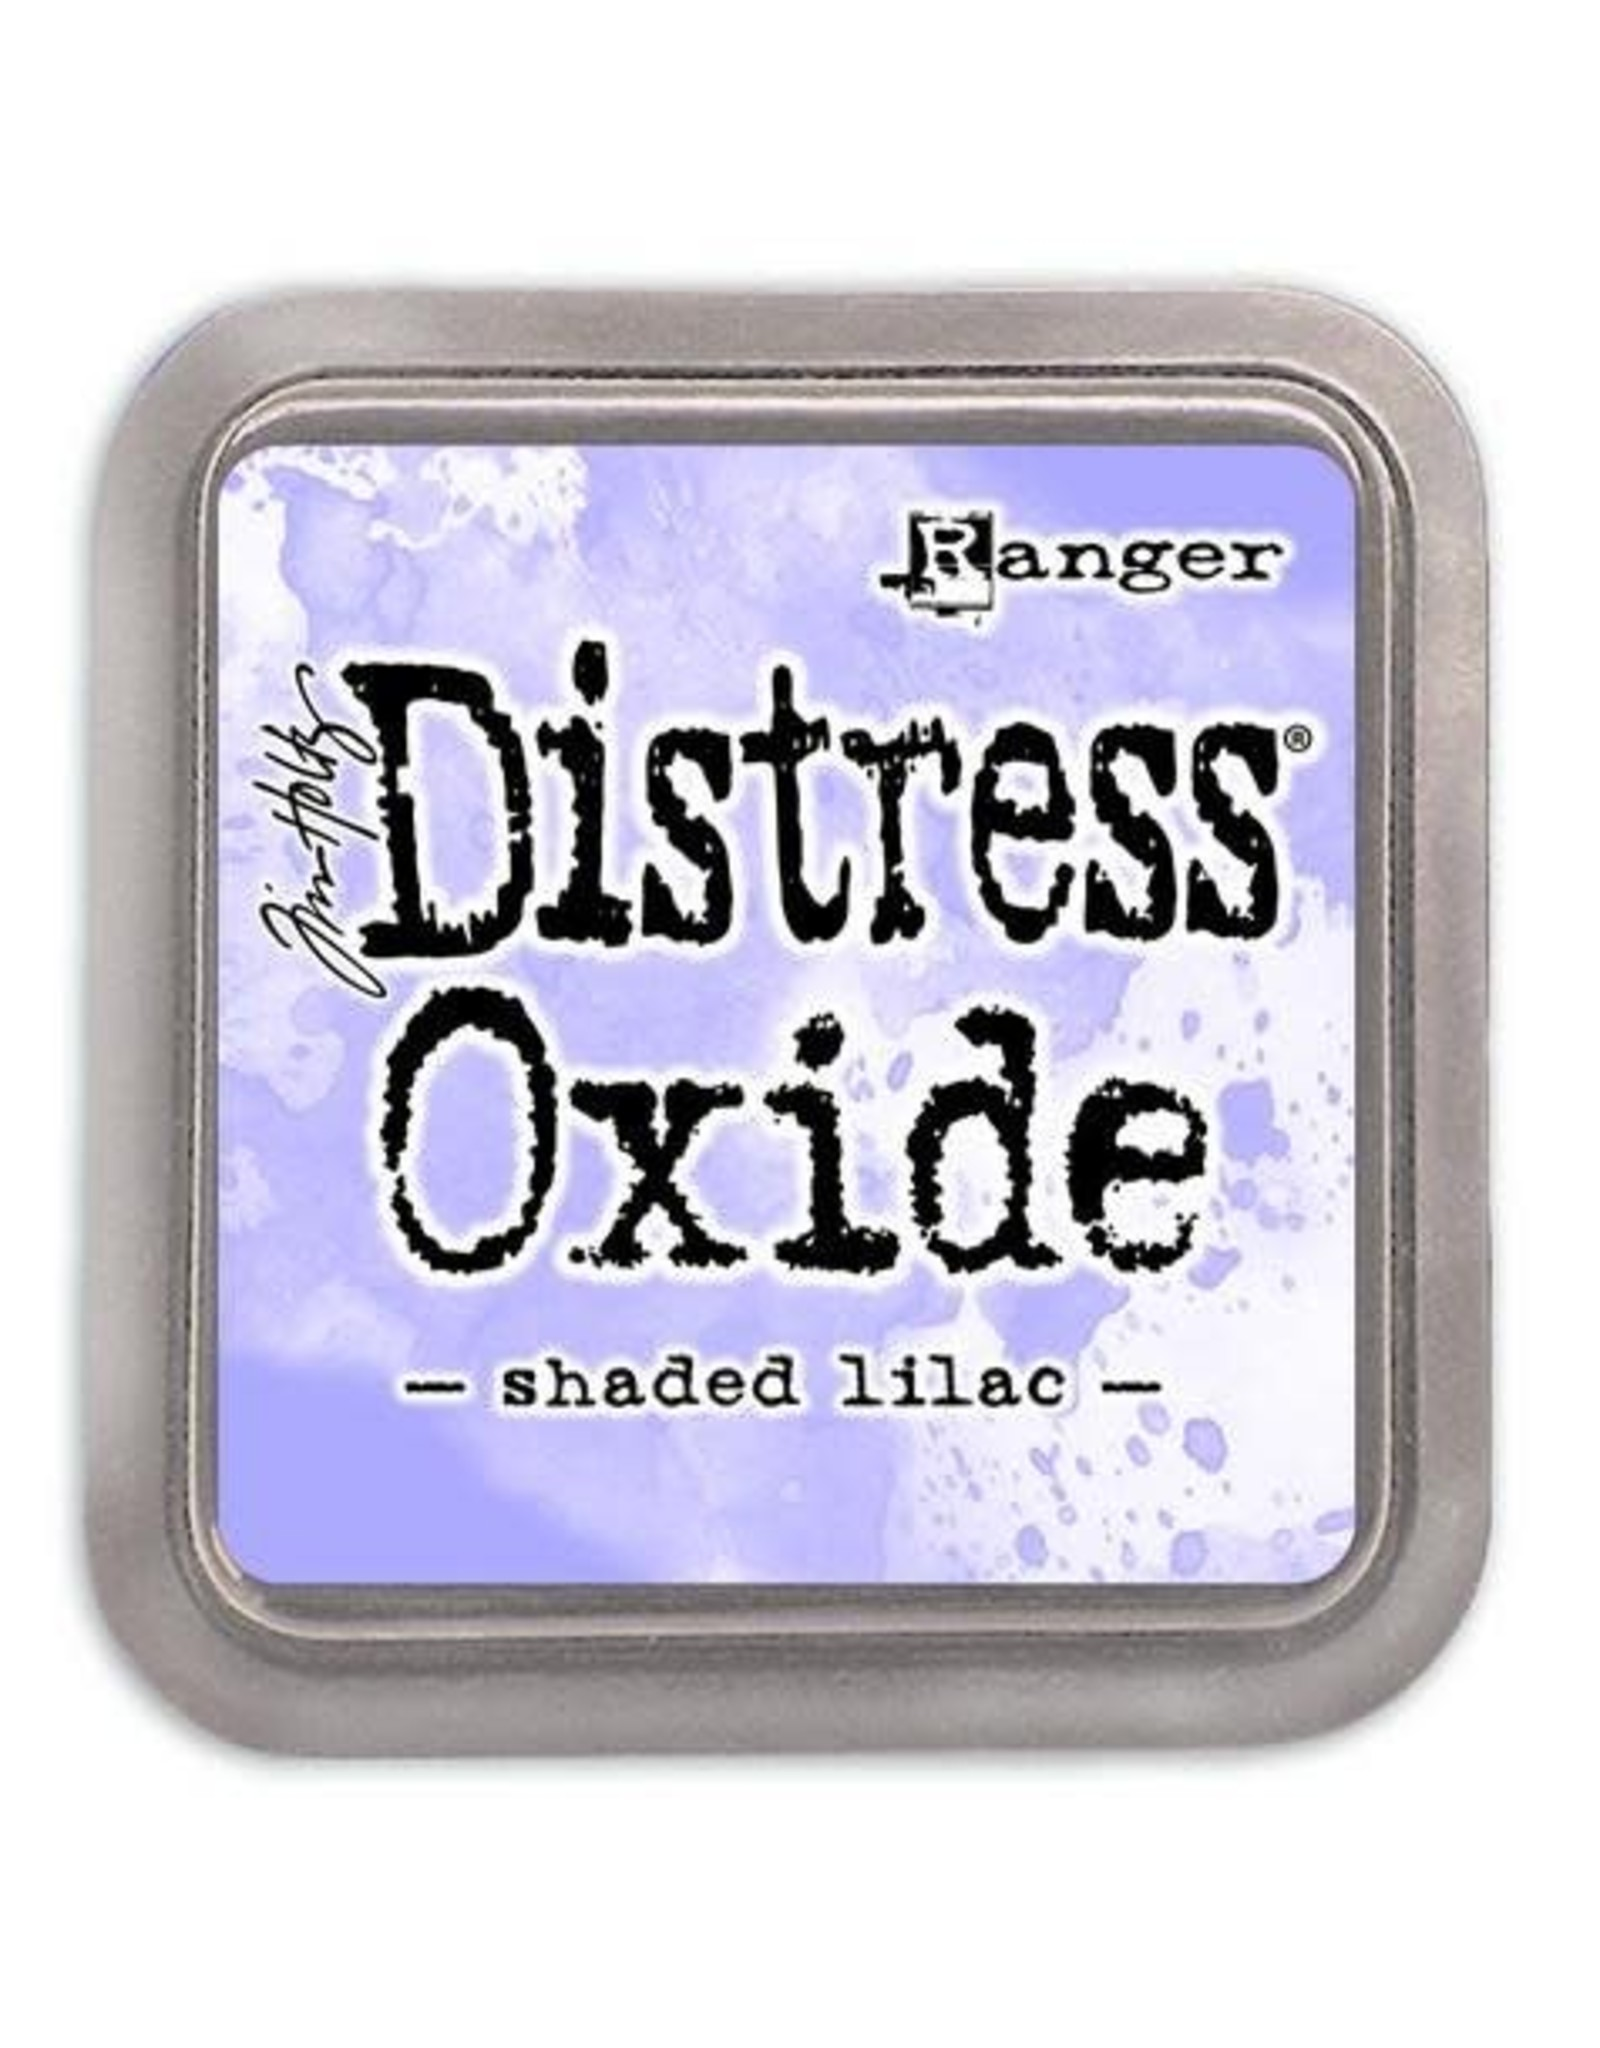 Ranger Distress Oxide Ranger Distress Oxide - shaded lilac